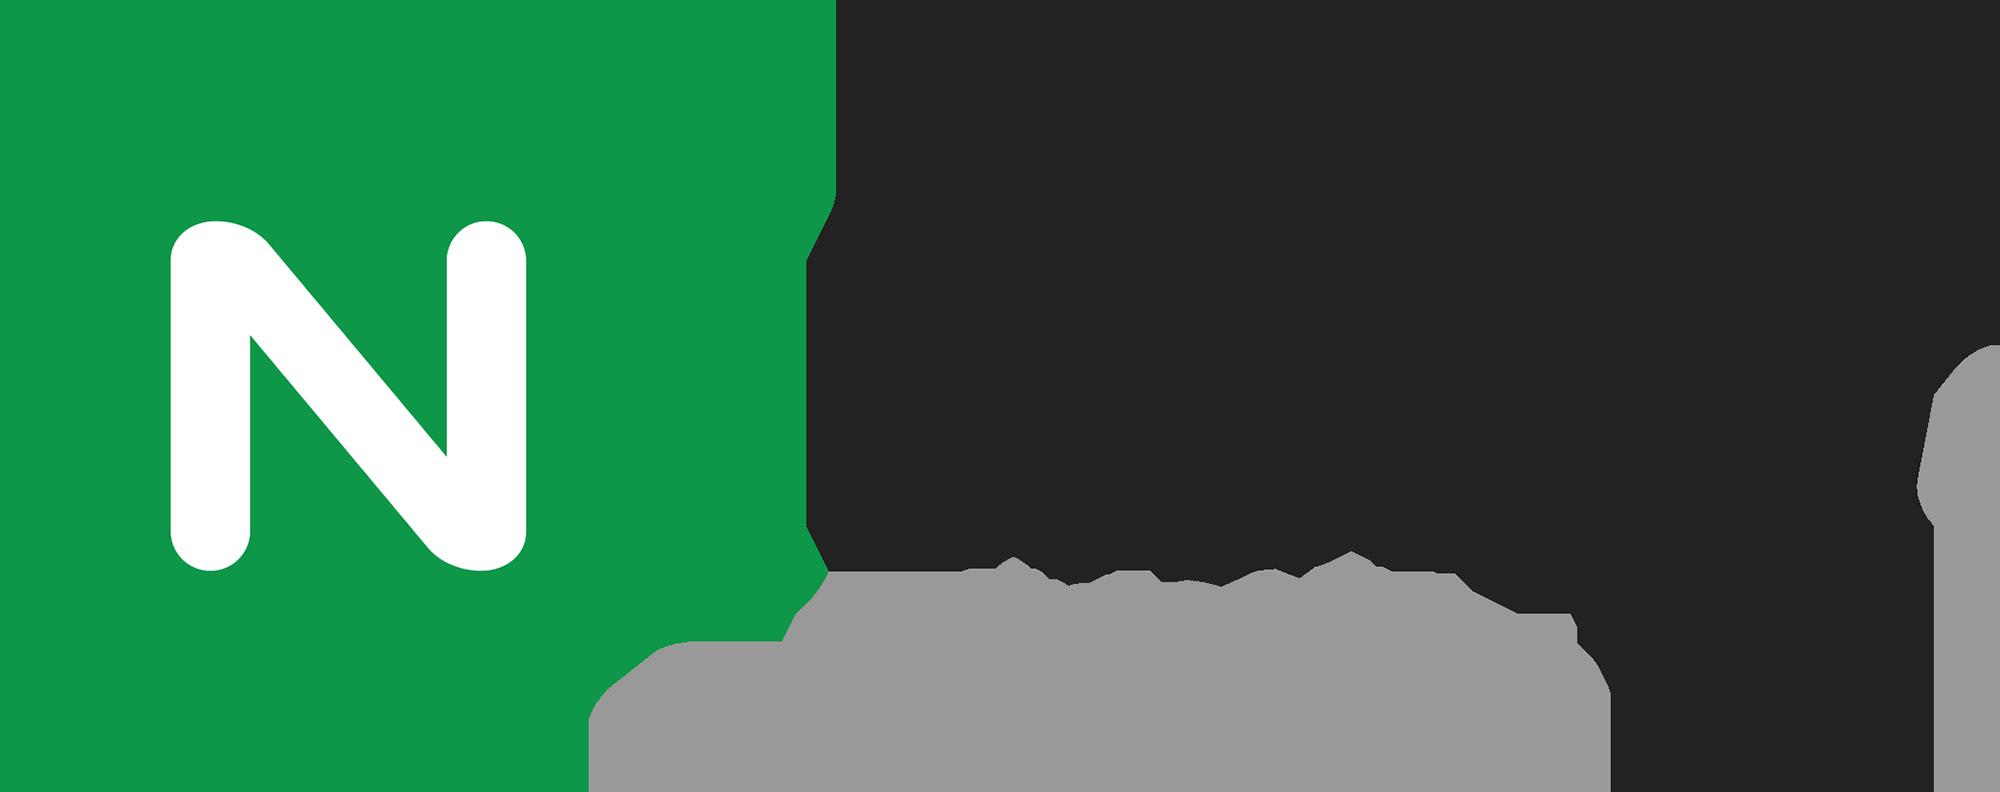 NGINX Logo Black Endorsement RGB